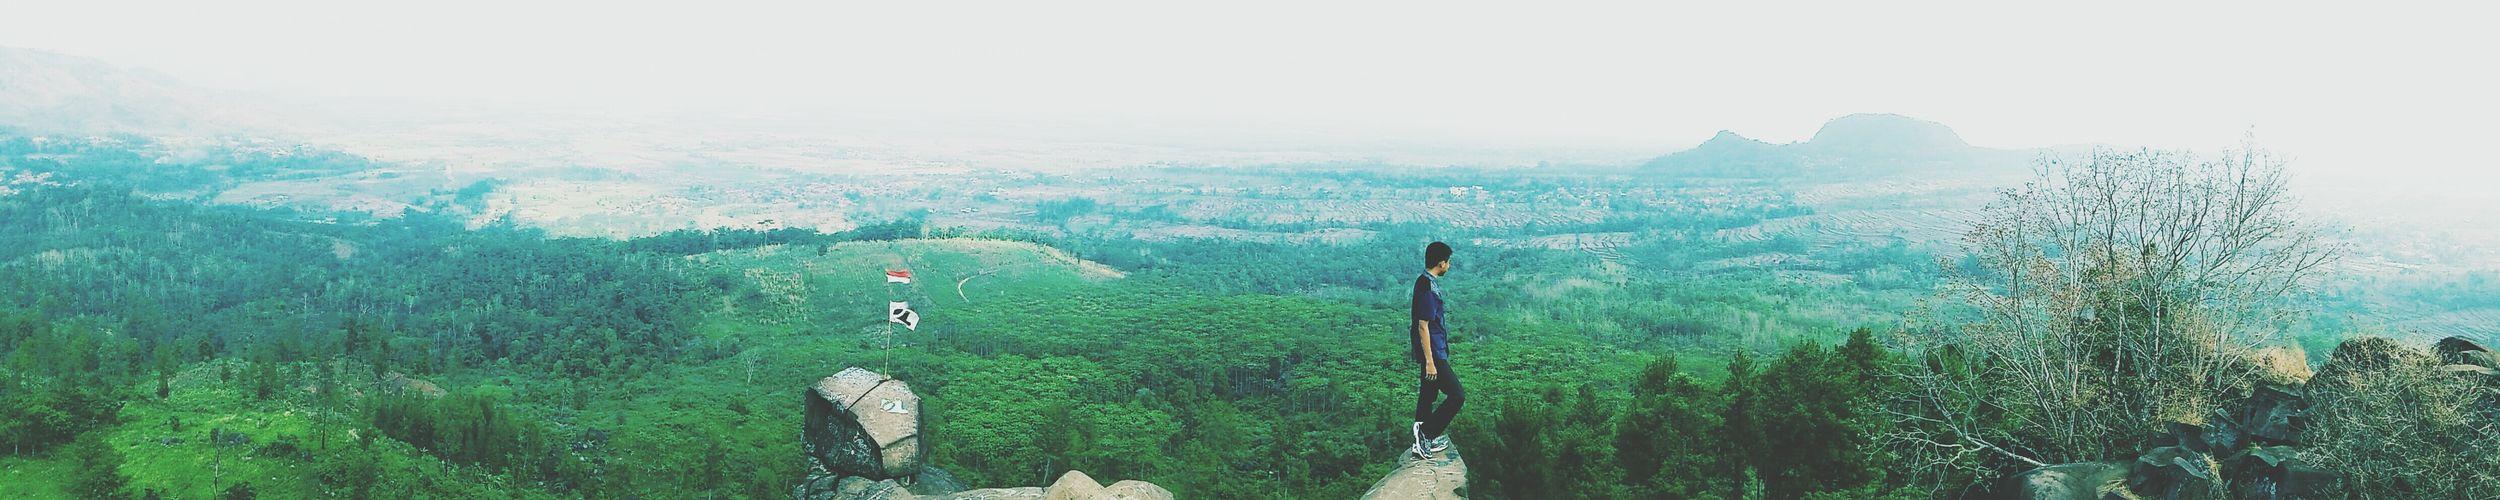 Looking around, Visitindonesia